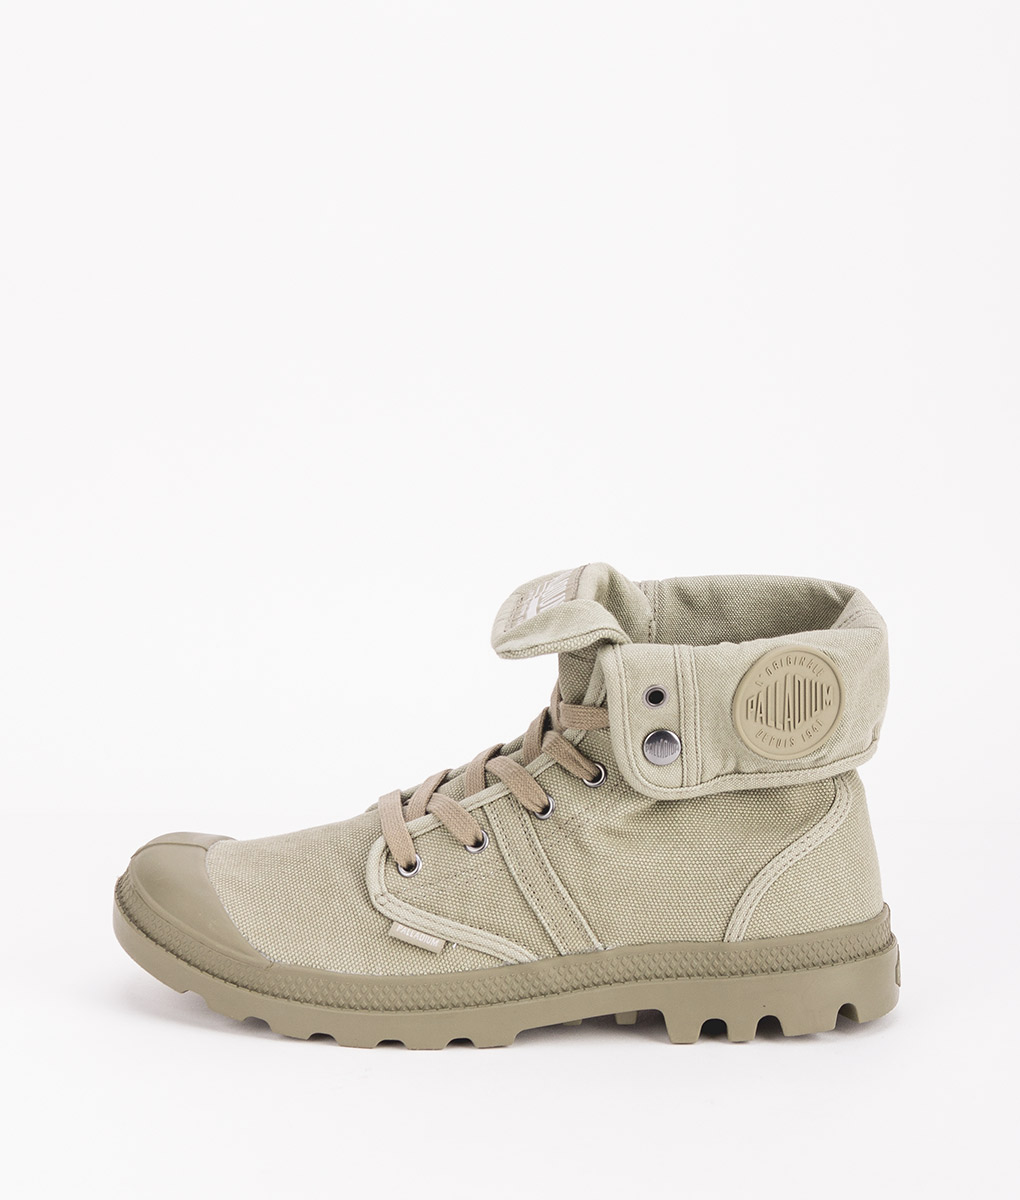 PALLADIUM Men Sneakers 2478 PALLABROUSE BAGGY, Vetiver Burnt 84.99